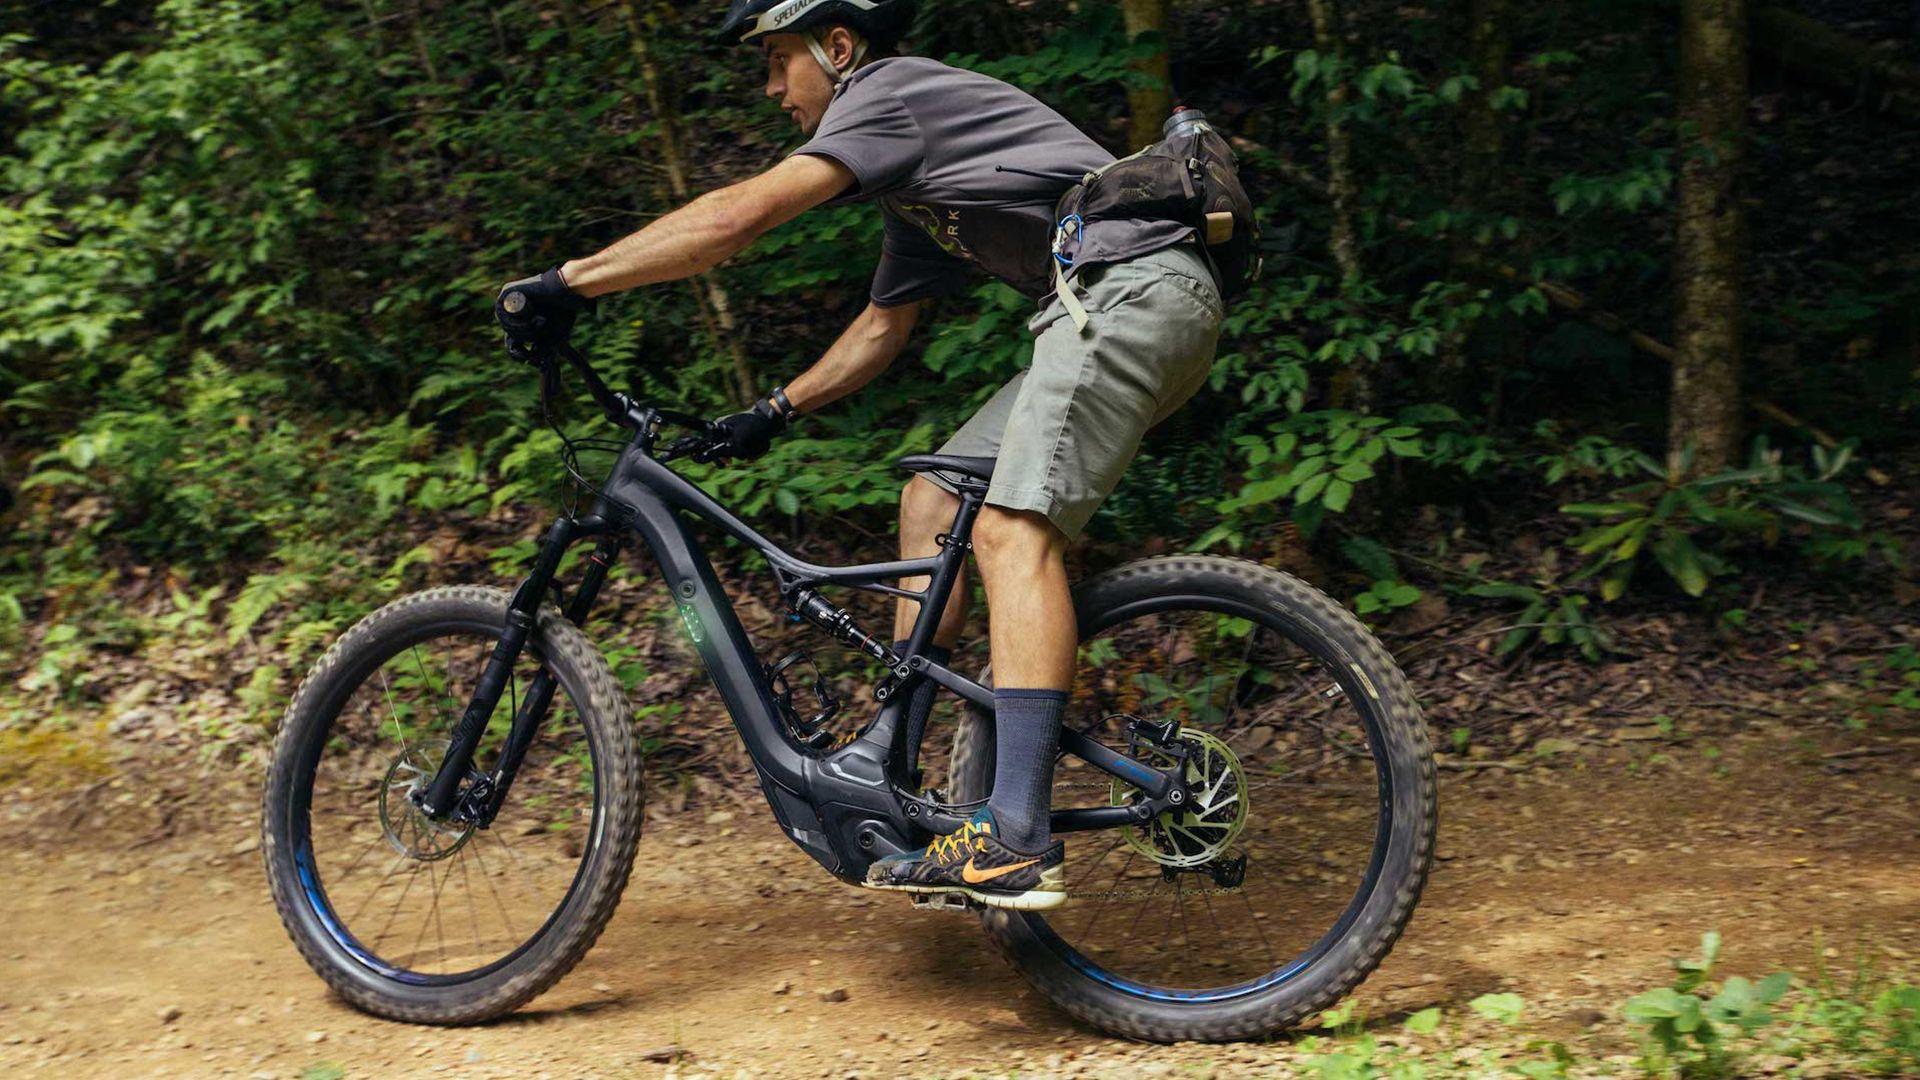 7d46f4e34ab CLIMB Works Mountain Biking in the Smoky Mountains